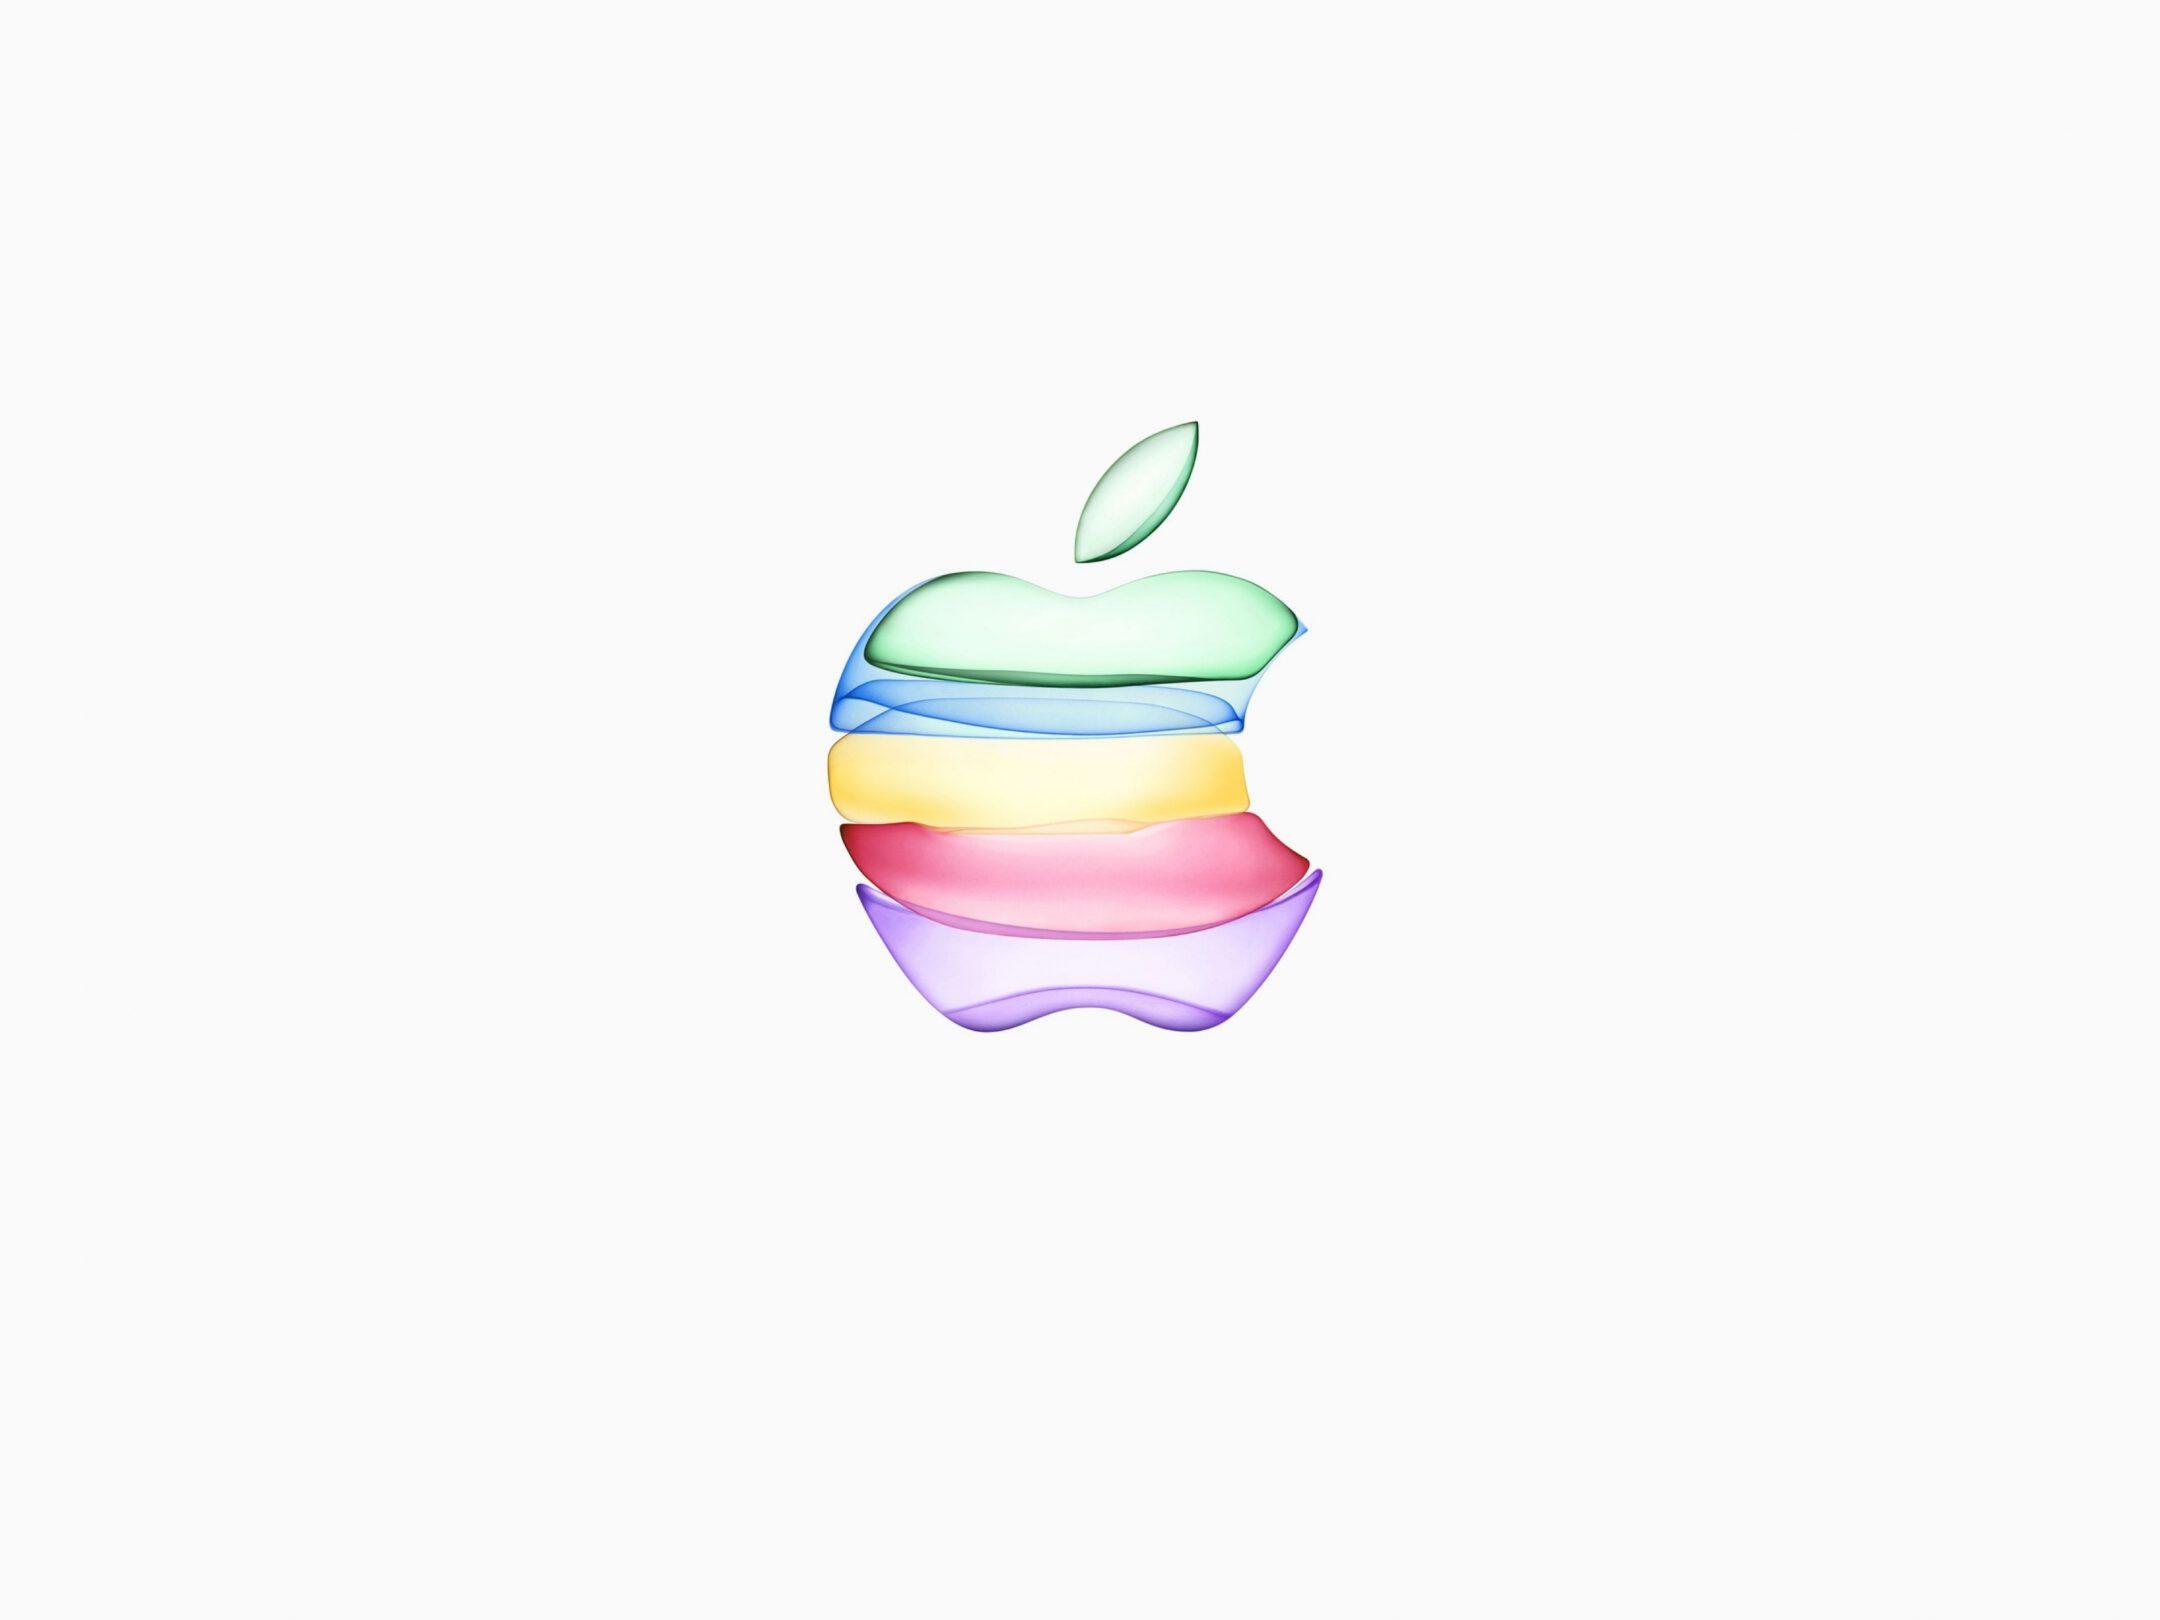 2160x1620 iPad wallpaper 4k iPhone 11 Apple Logo White Background iPad Wallpaper 2160x1620 pixels resolution